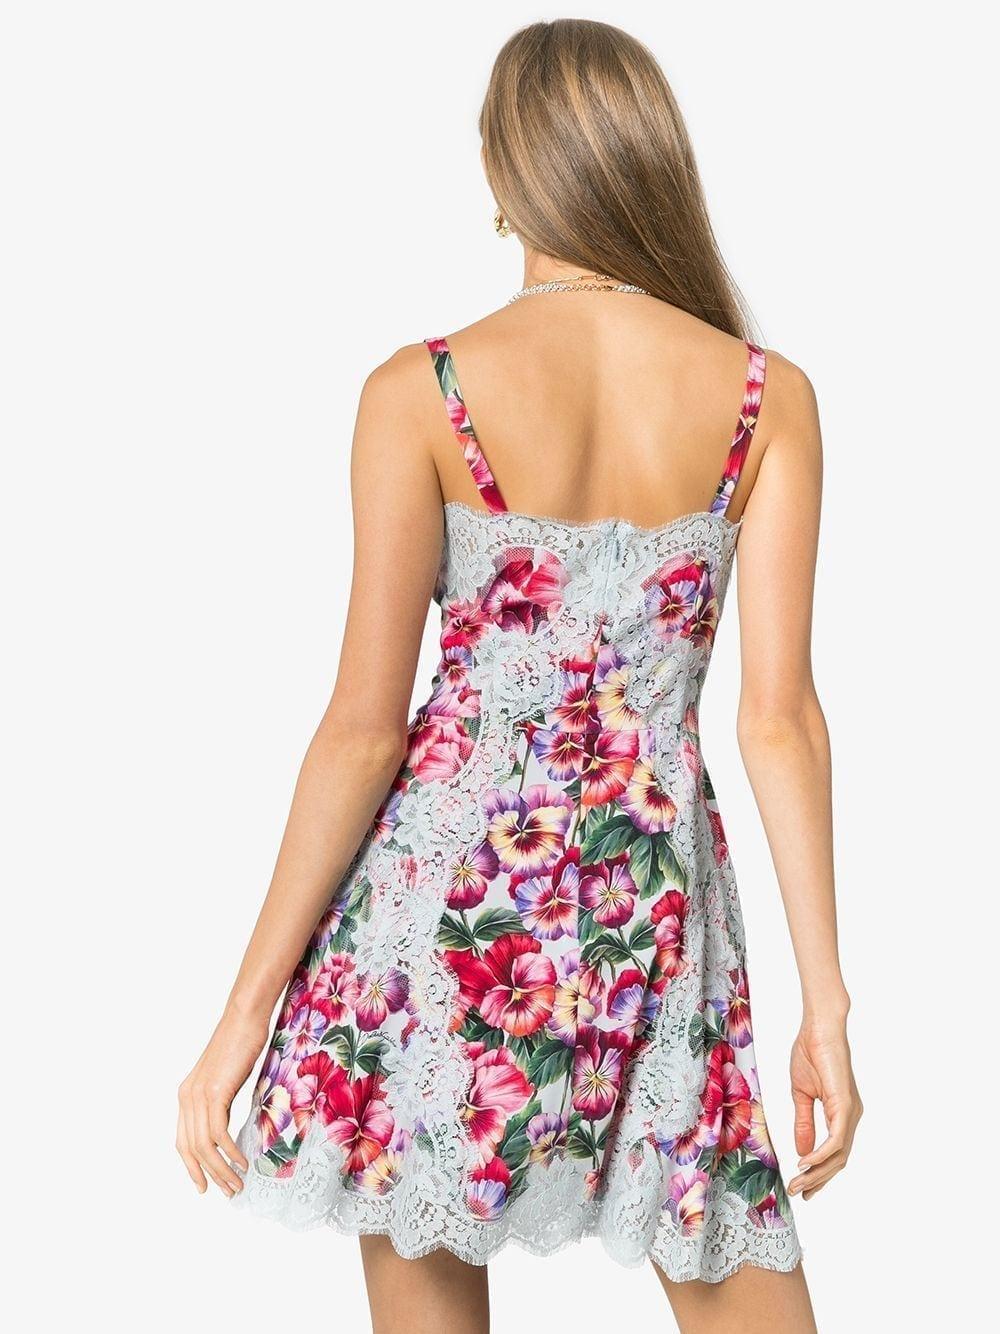 DOLCE & GABBANA Lace Trim Floral Dress